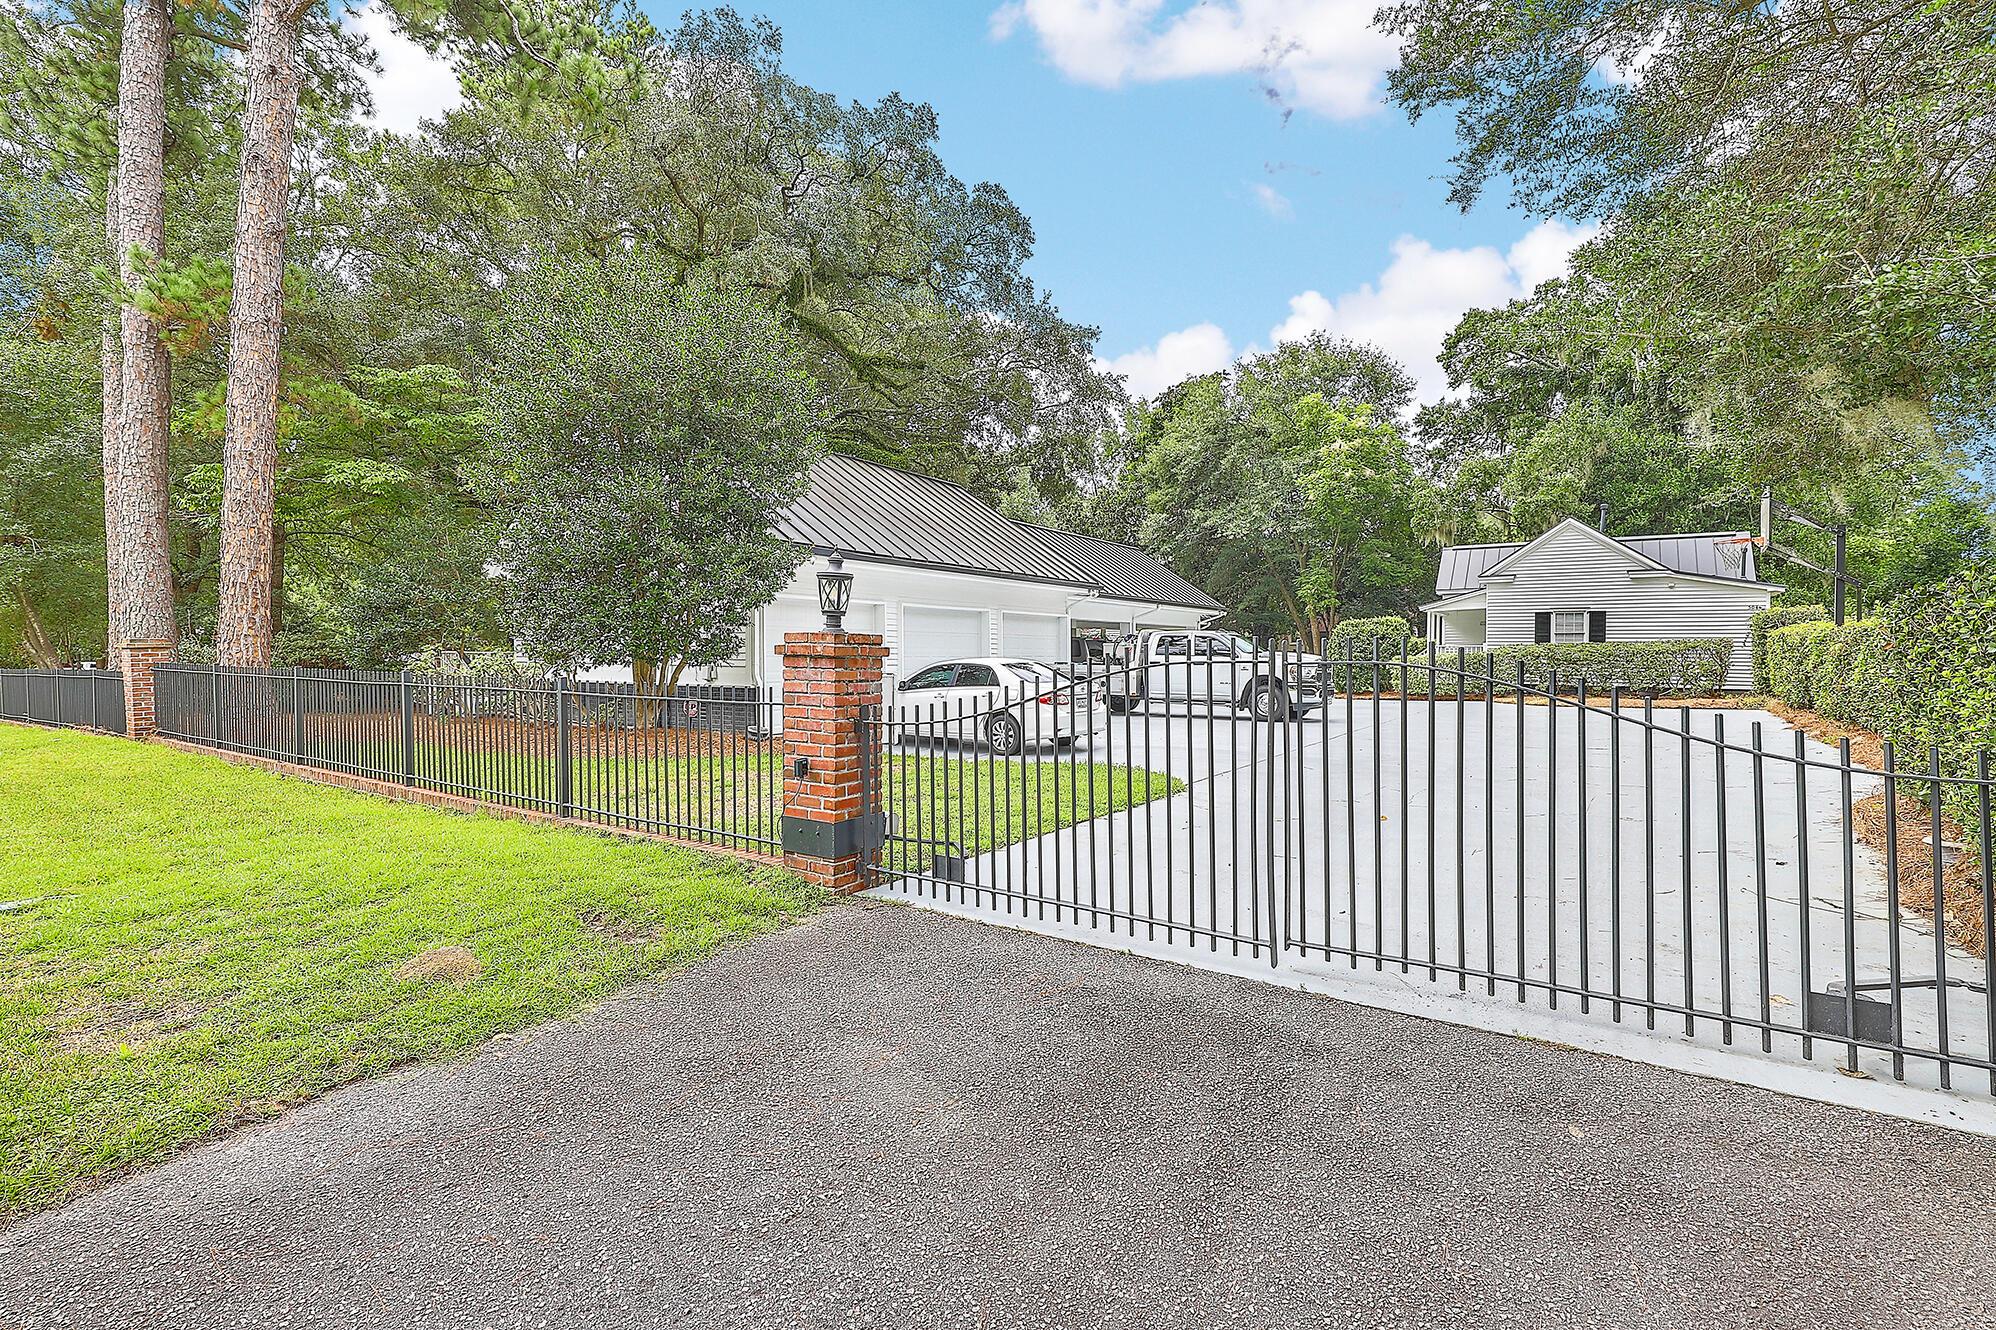 Summerville Homes For Sale - 102 Hickory, Summerville, SC - 17